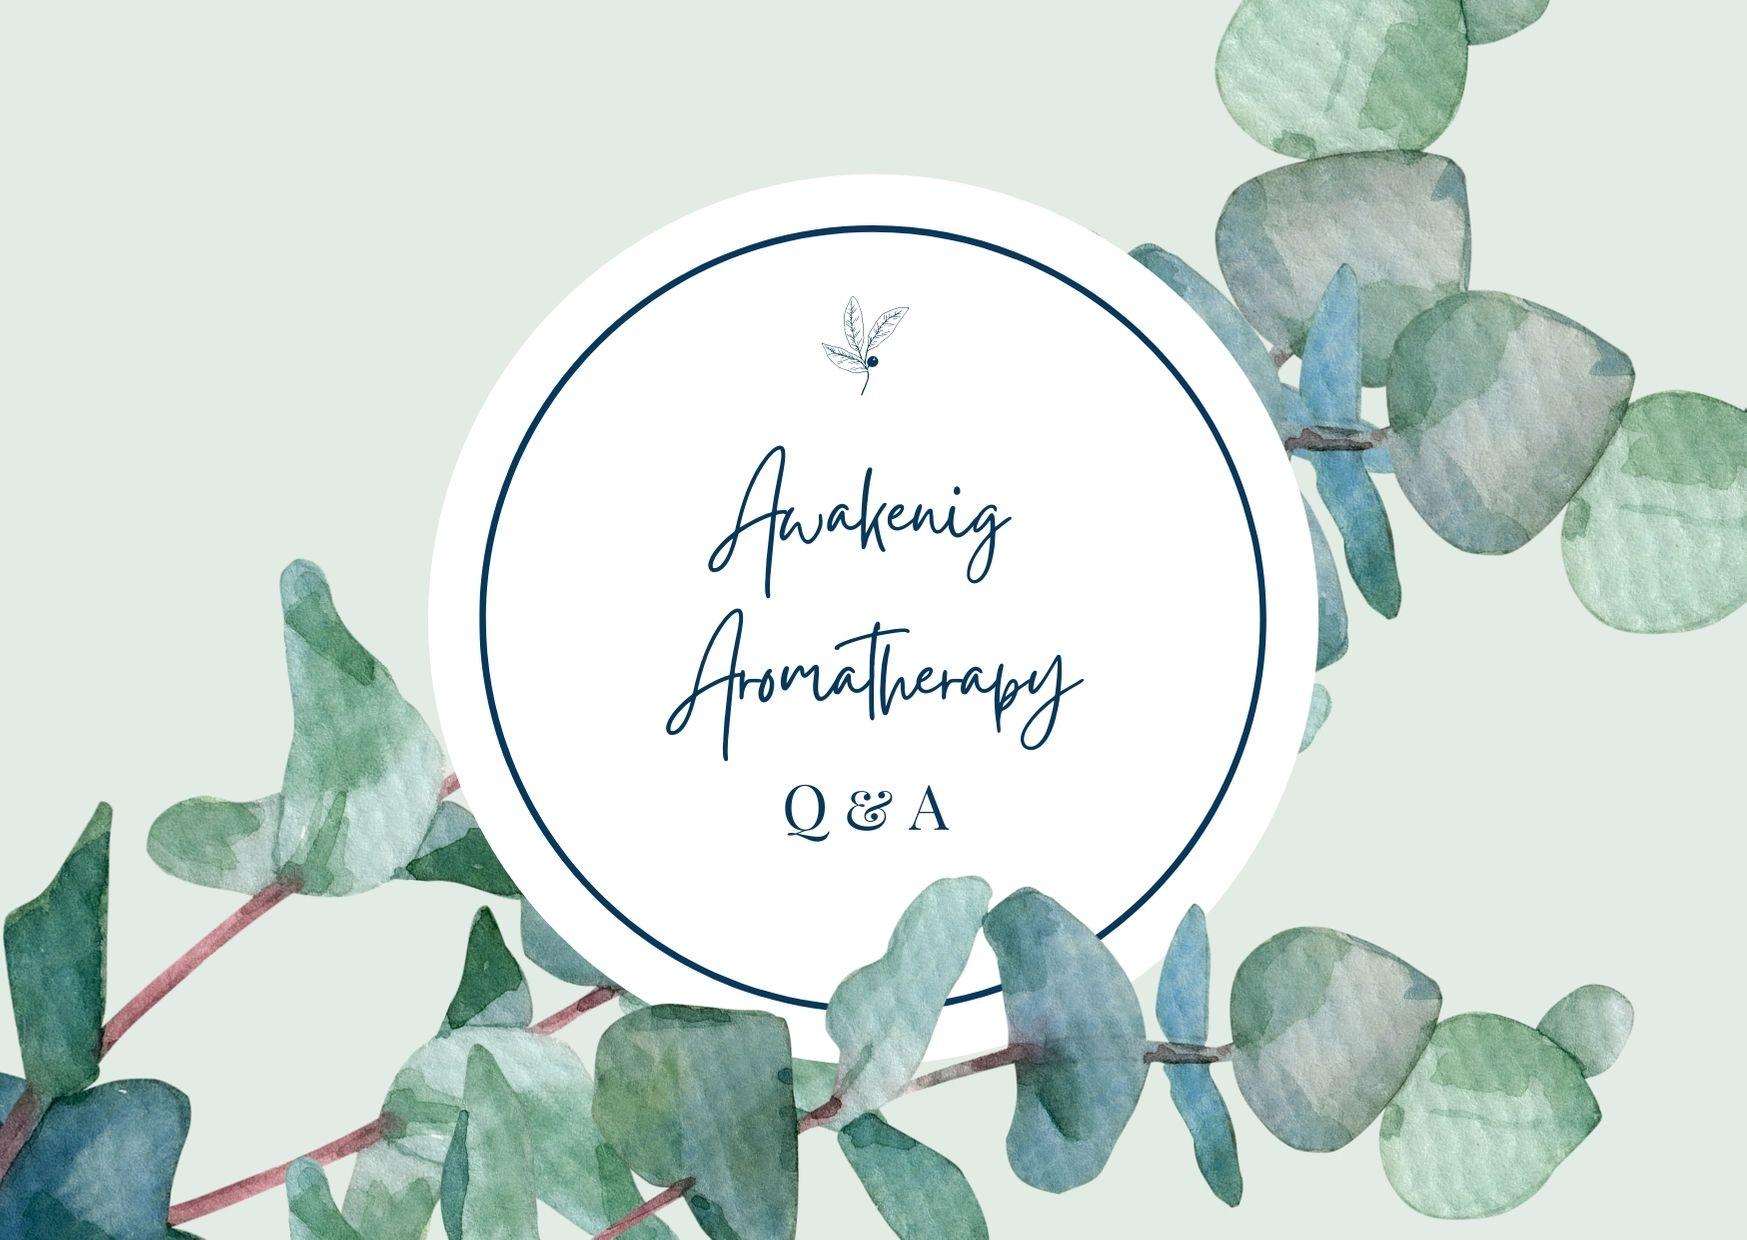 Awakening Aromatherapy® Q&A